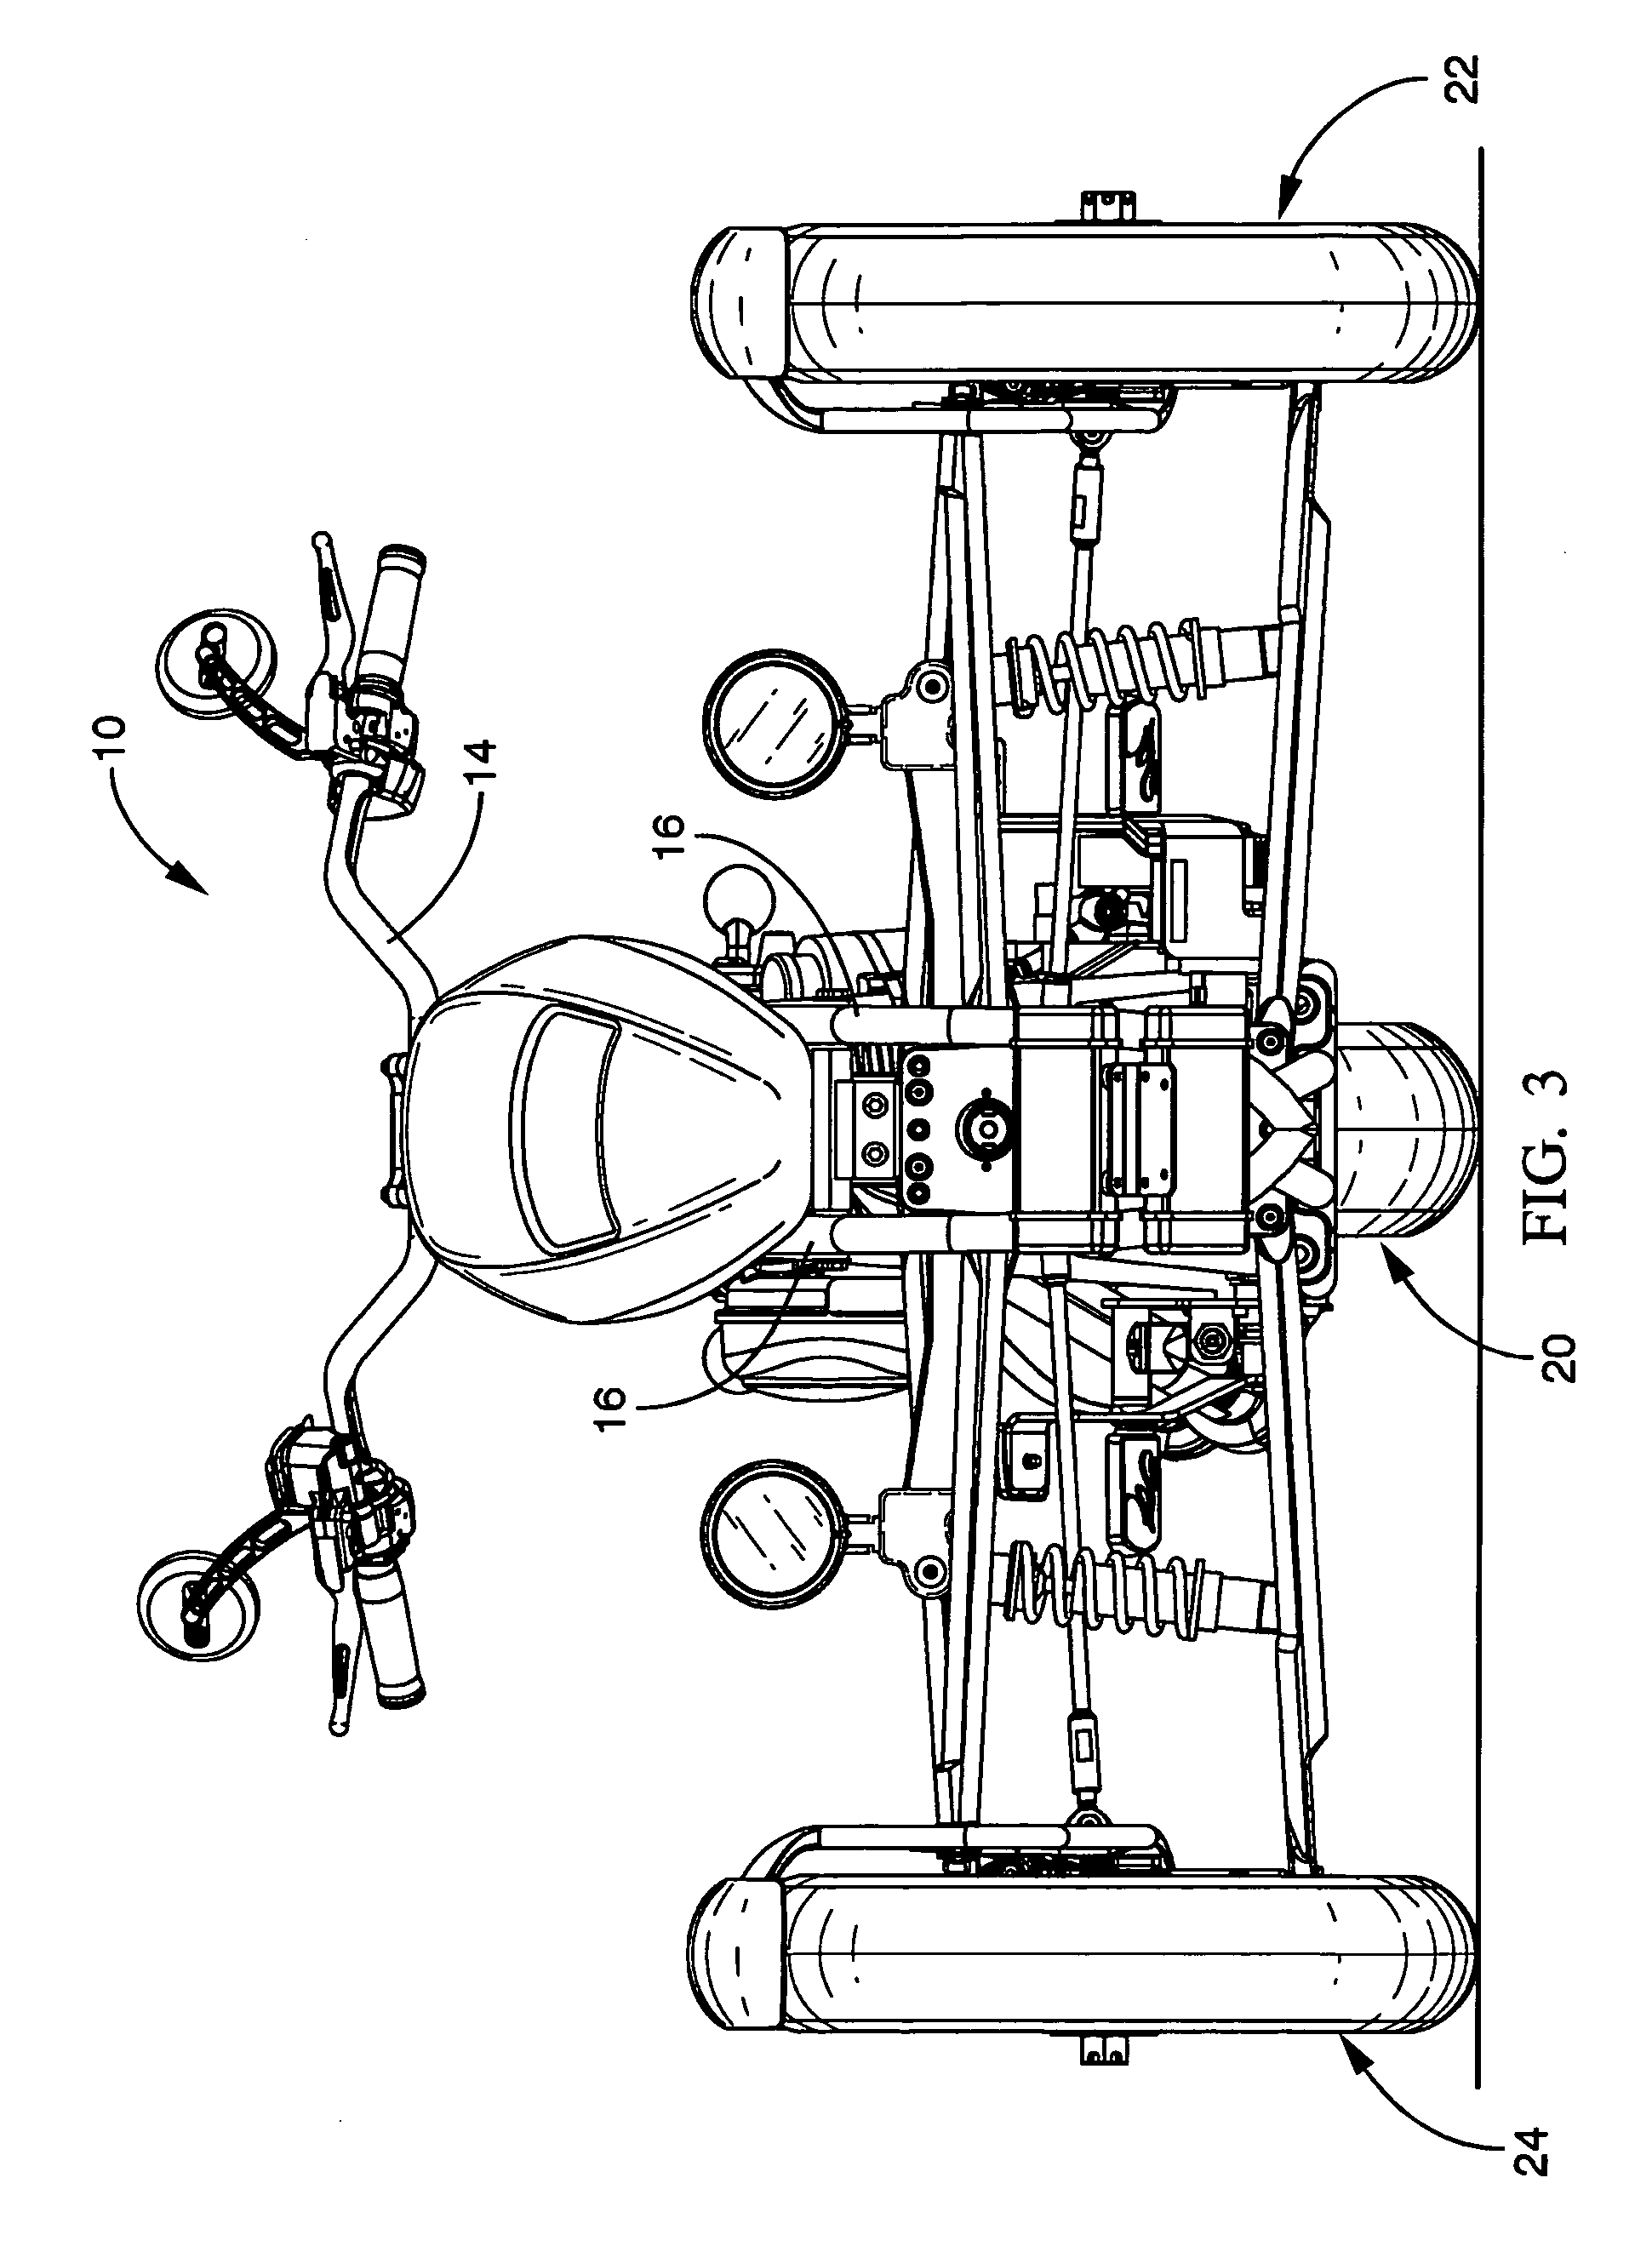 1999 infiniti i30 engine diagram free download wiring diagrams